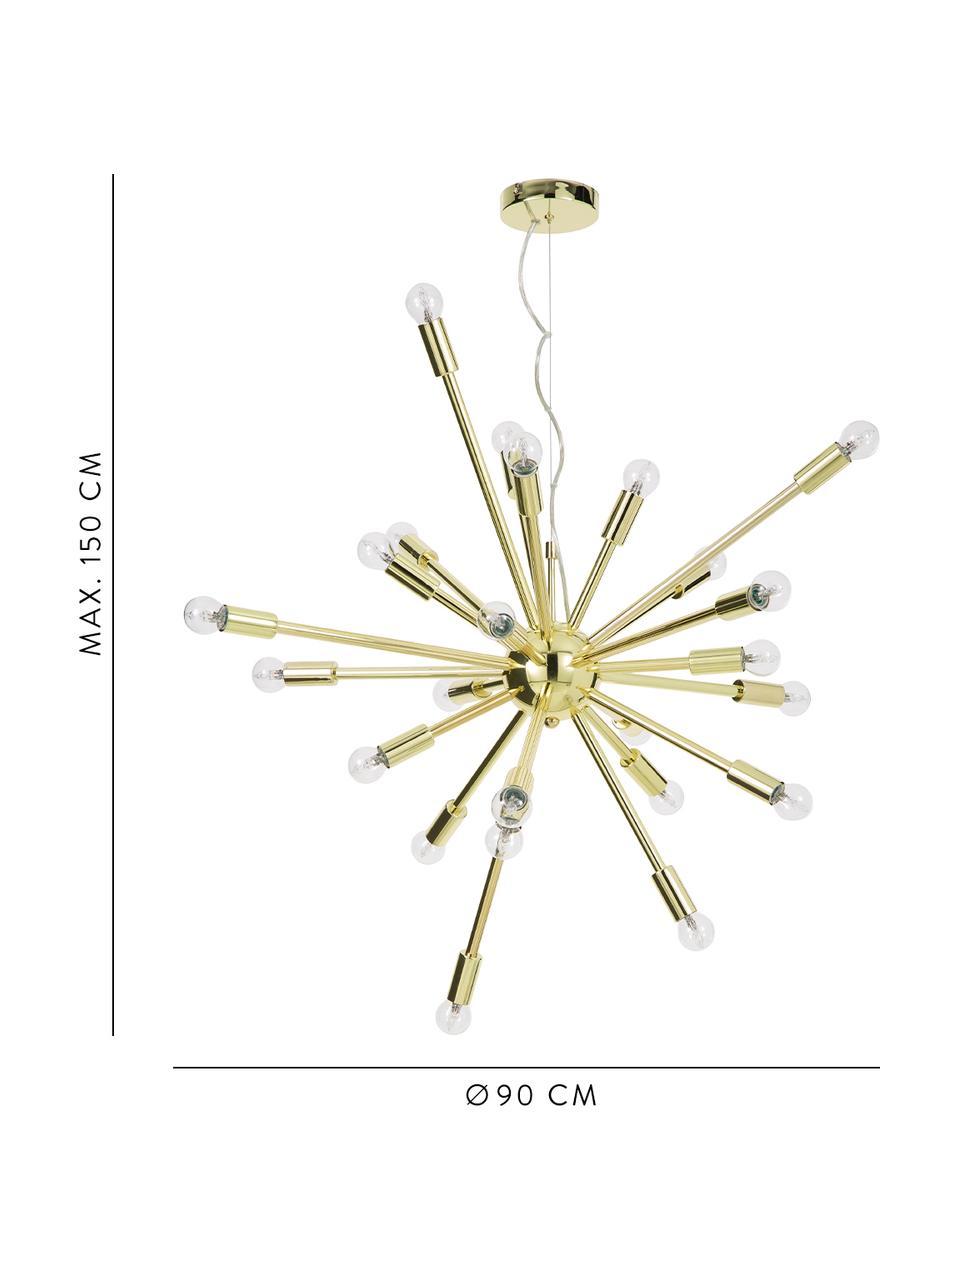 Grote hanglamp Spike in goudkleur, Lampenkap: metaal, Baldakijn: metaal, Baldakijn: goudkleurig. Lampenkap: goudkleurig. Snoer: transparant, Ø 90 cm